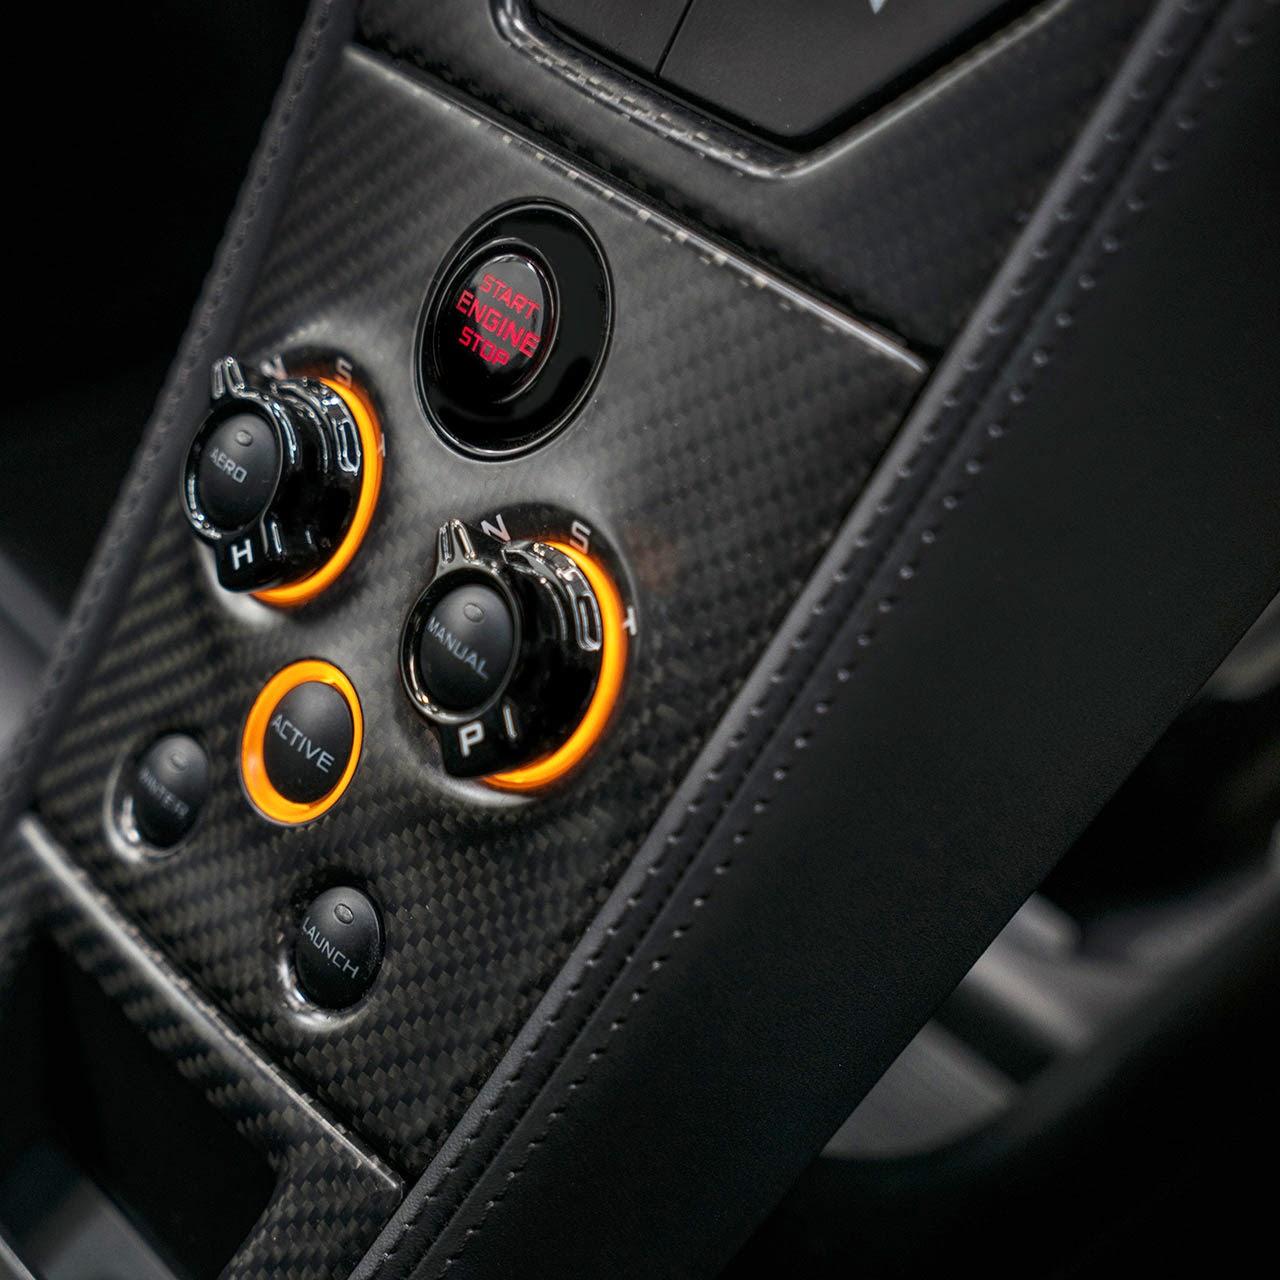 McLaren MSO 650S Coupe Concept dash detail